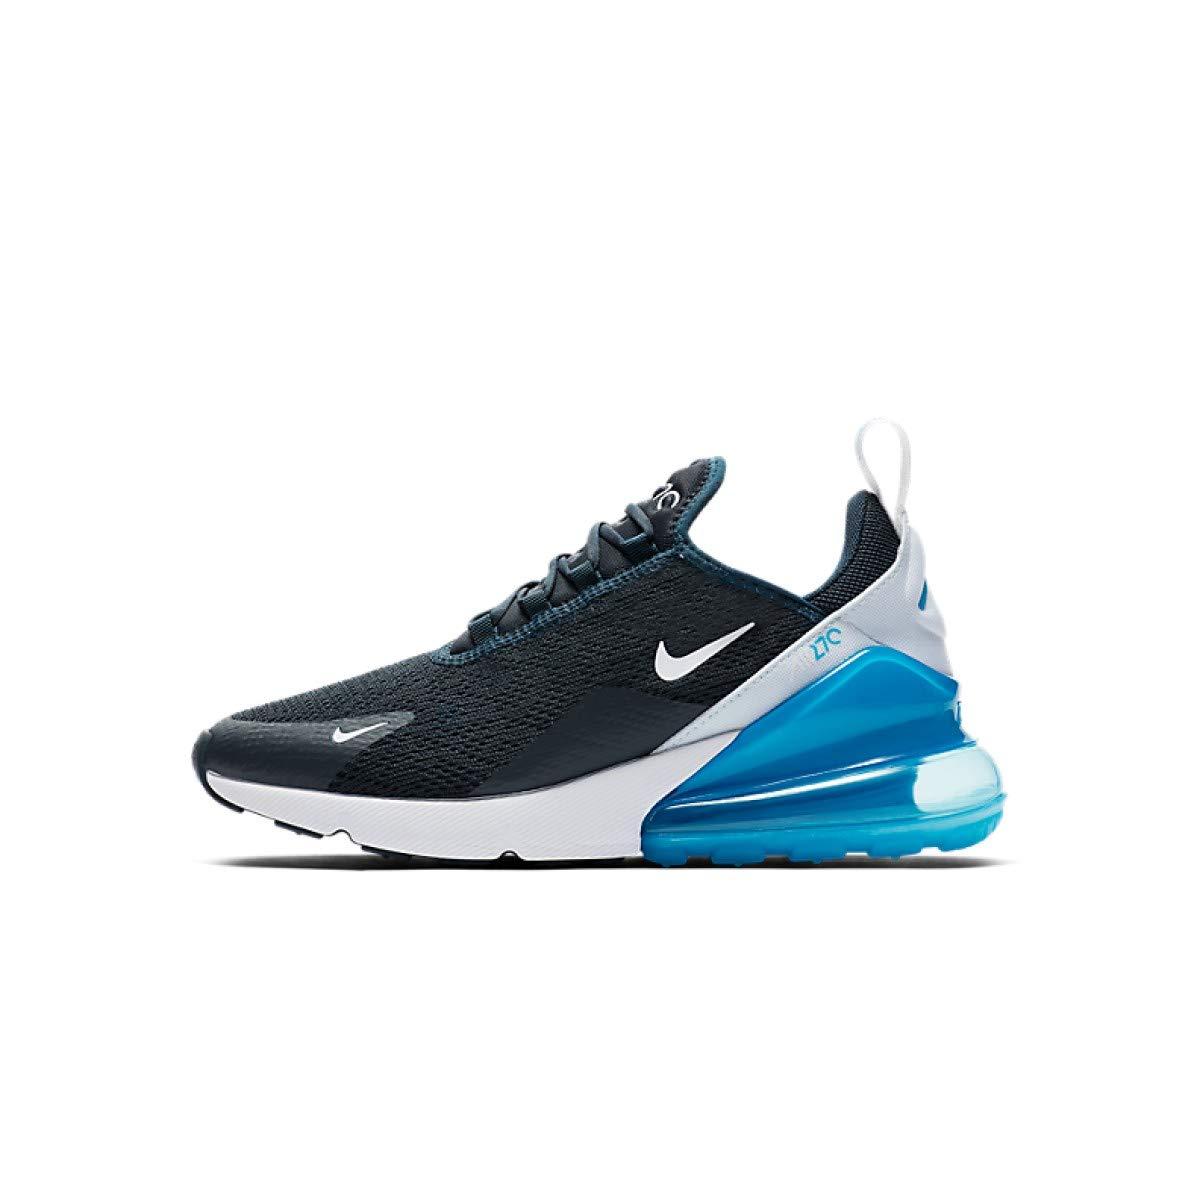 | Nike W Air Max 270 Womens Sneakers AH6789 403